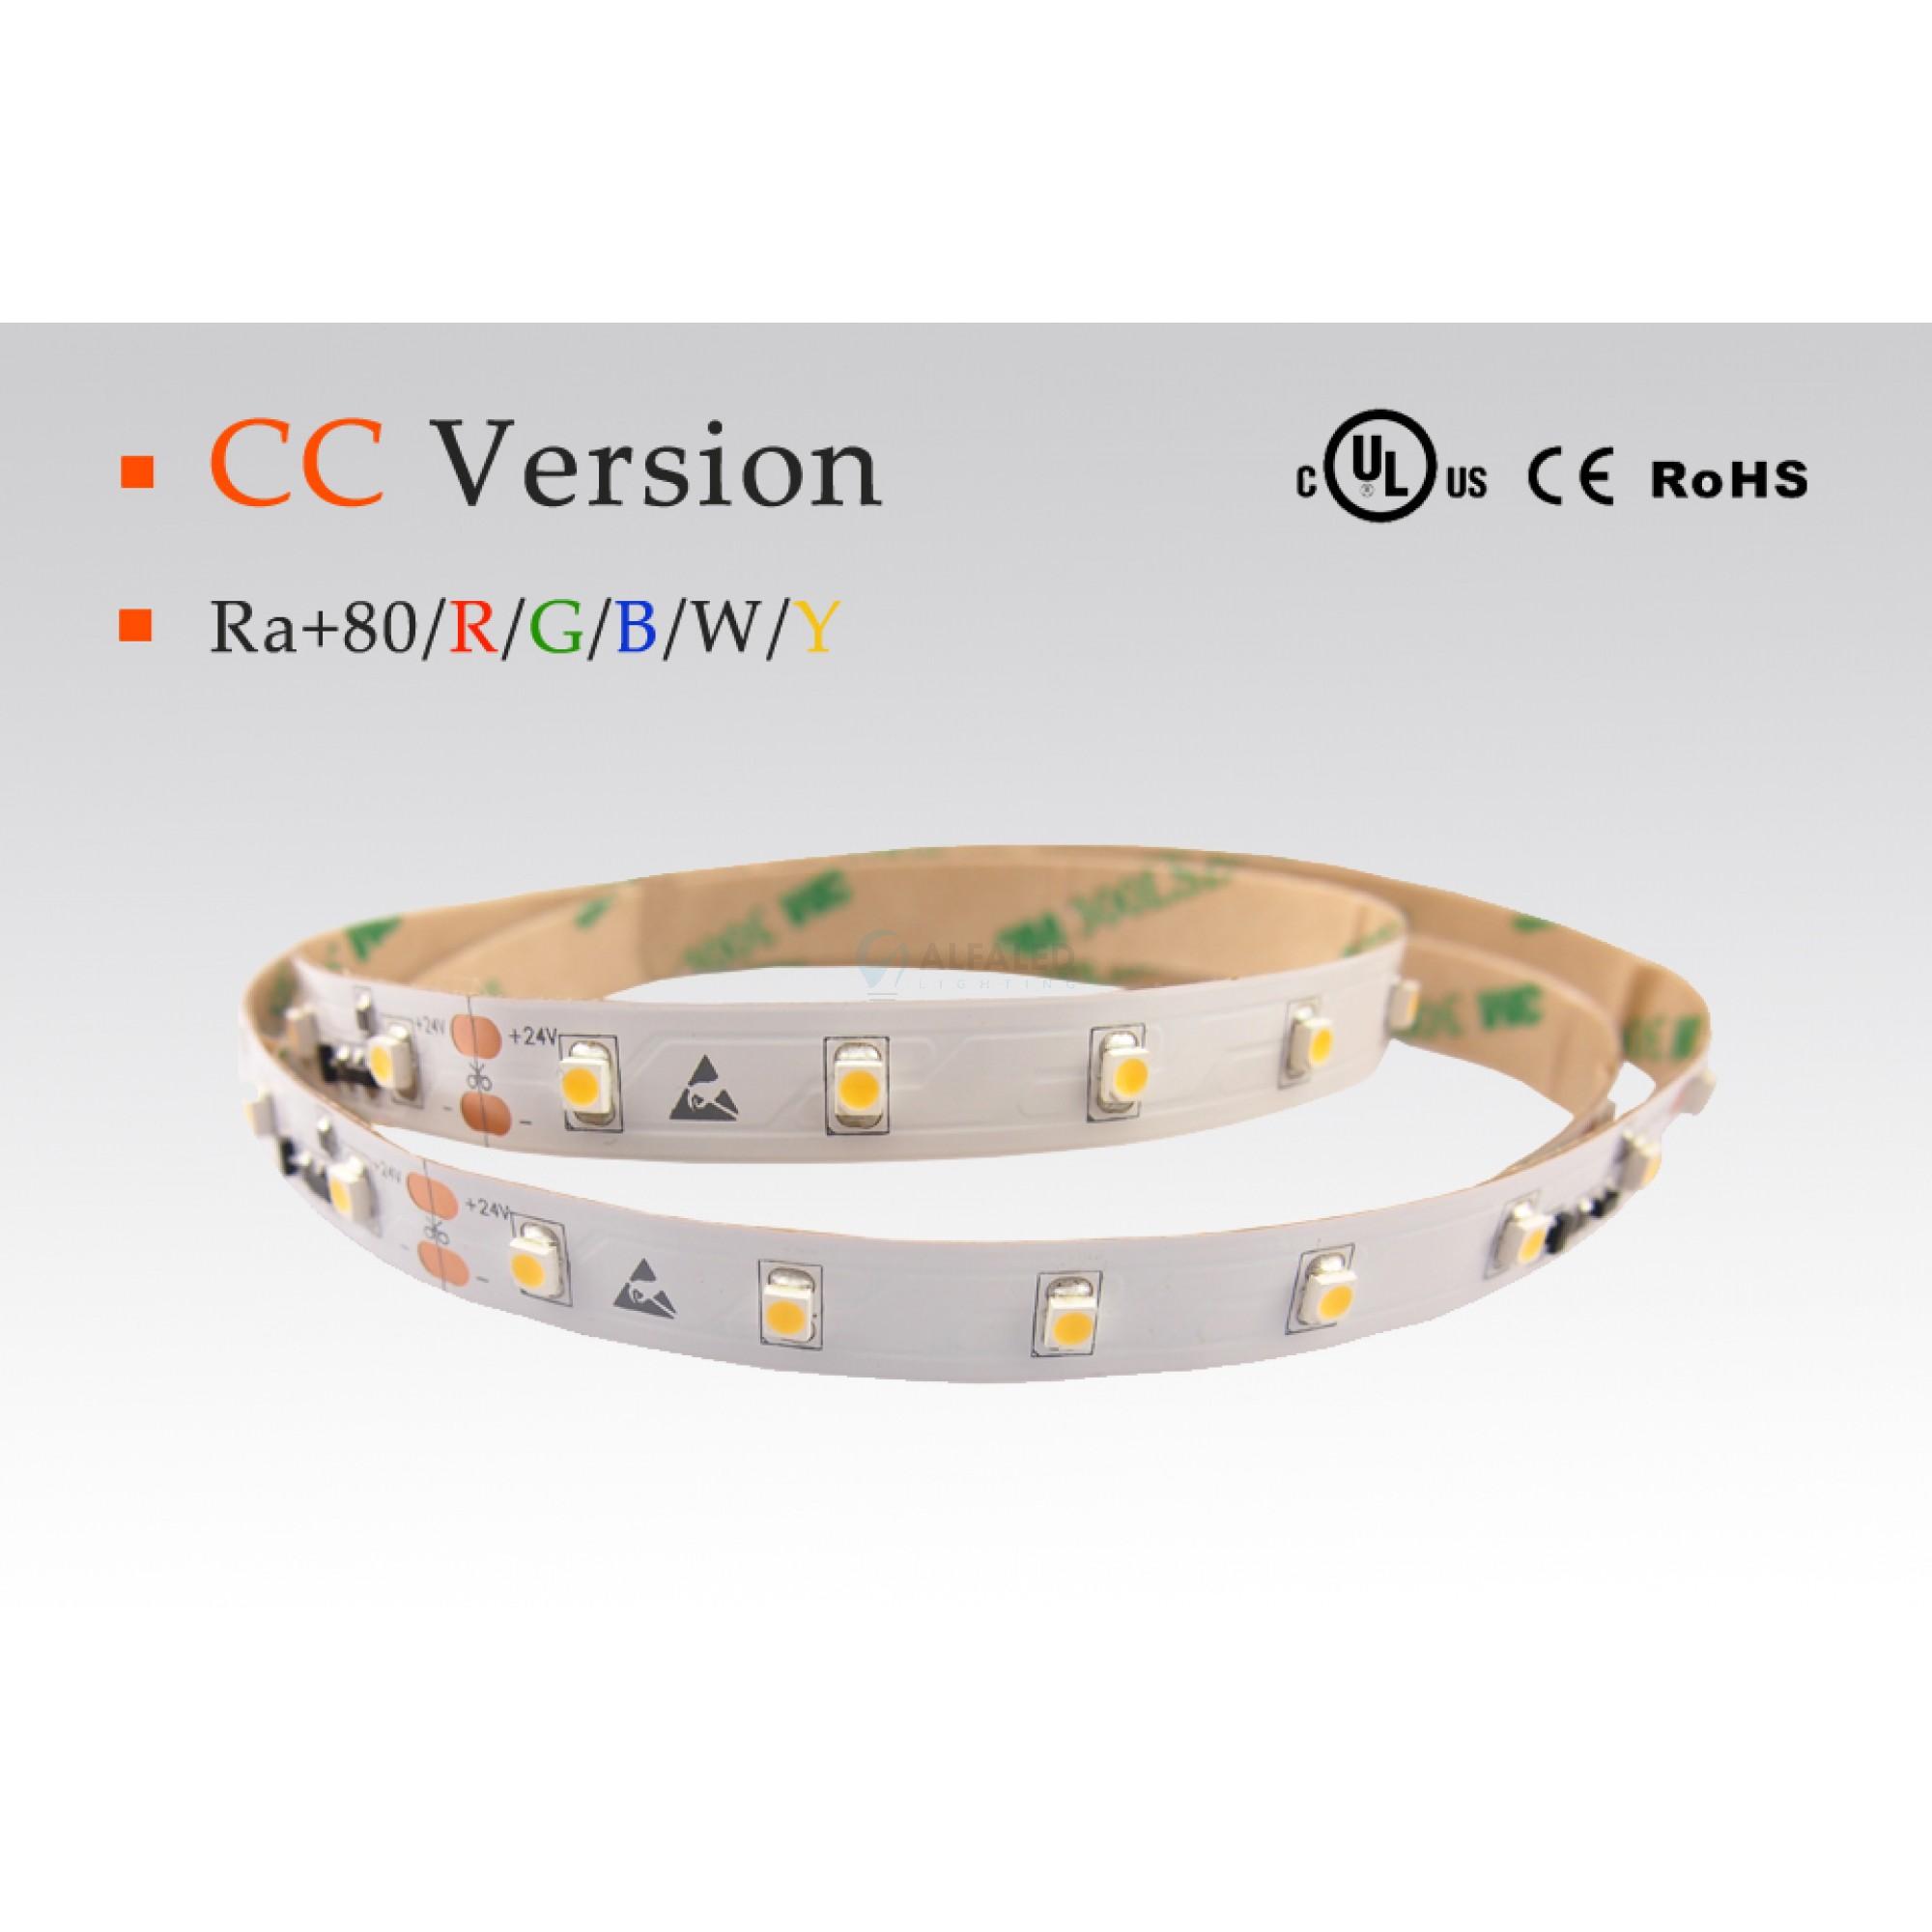 LED pás Professional Constant current IC 4,8W/m 60LED/m - BLUE,GREEN